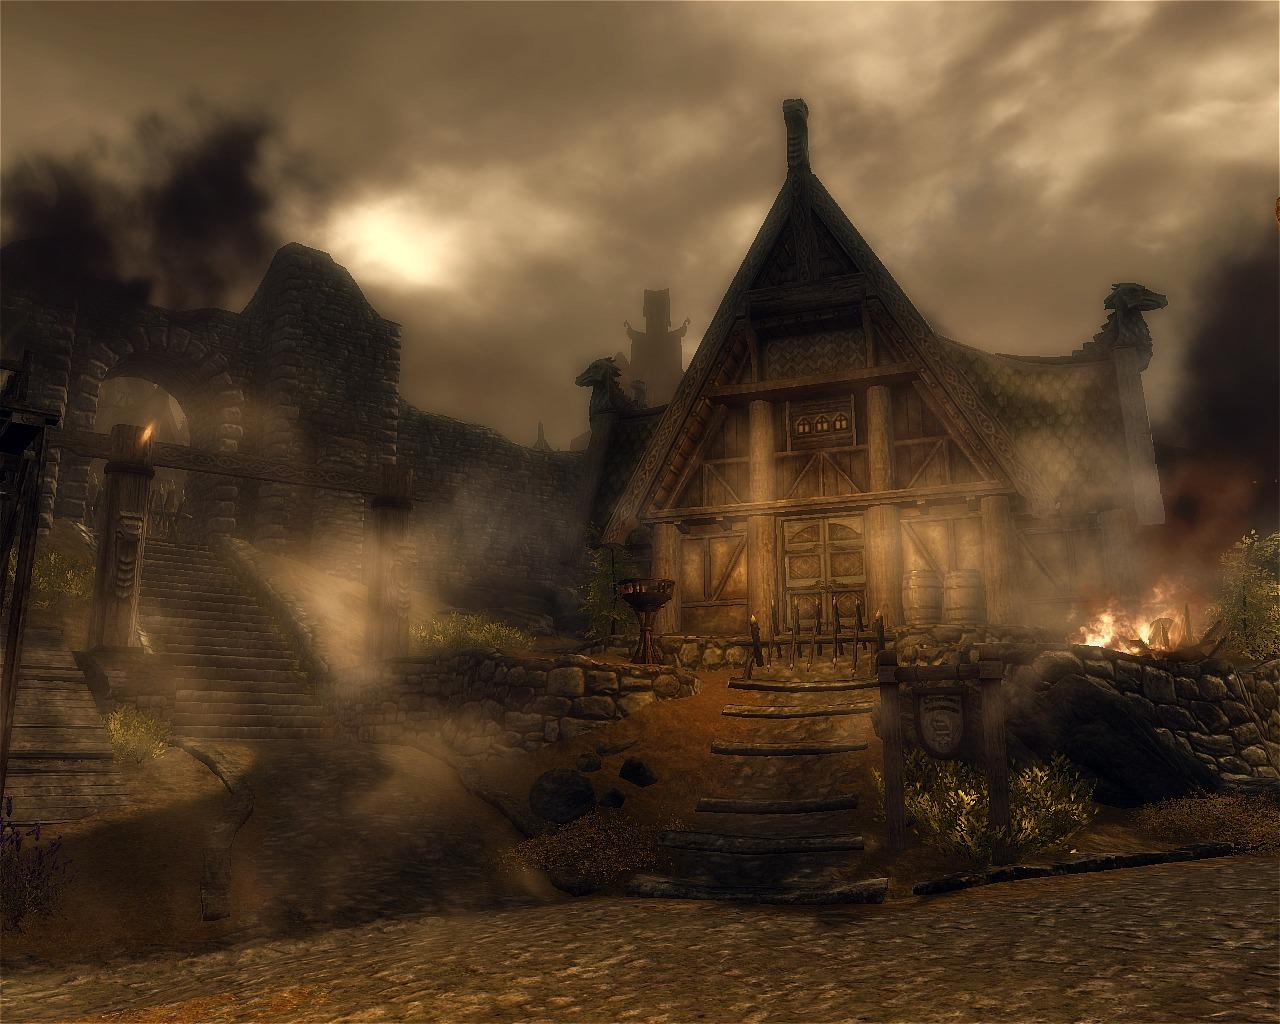 skyrim elder scrolls v quest guide